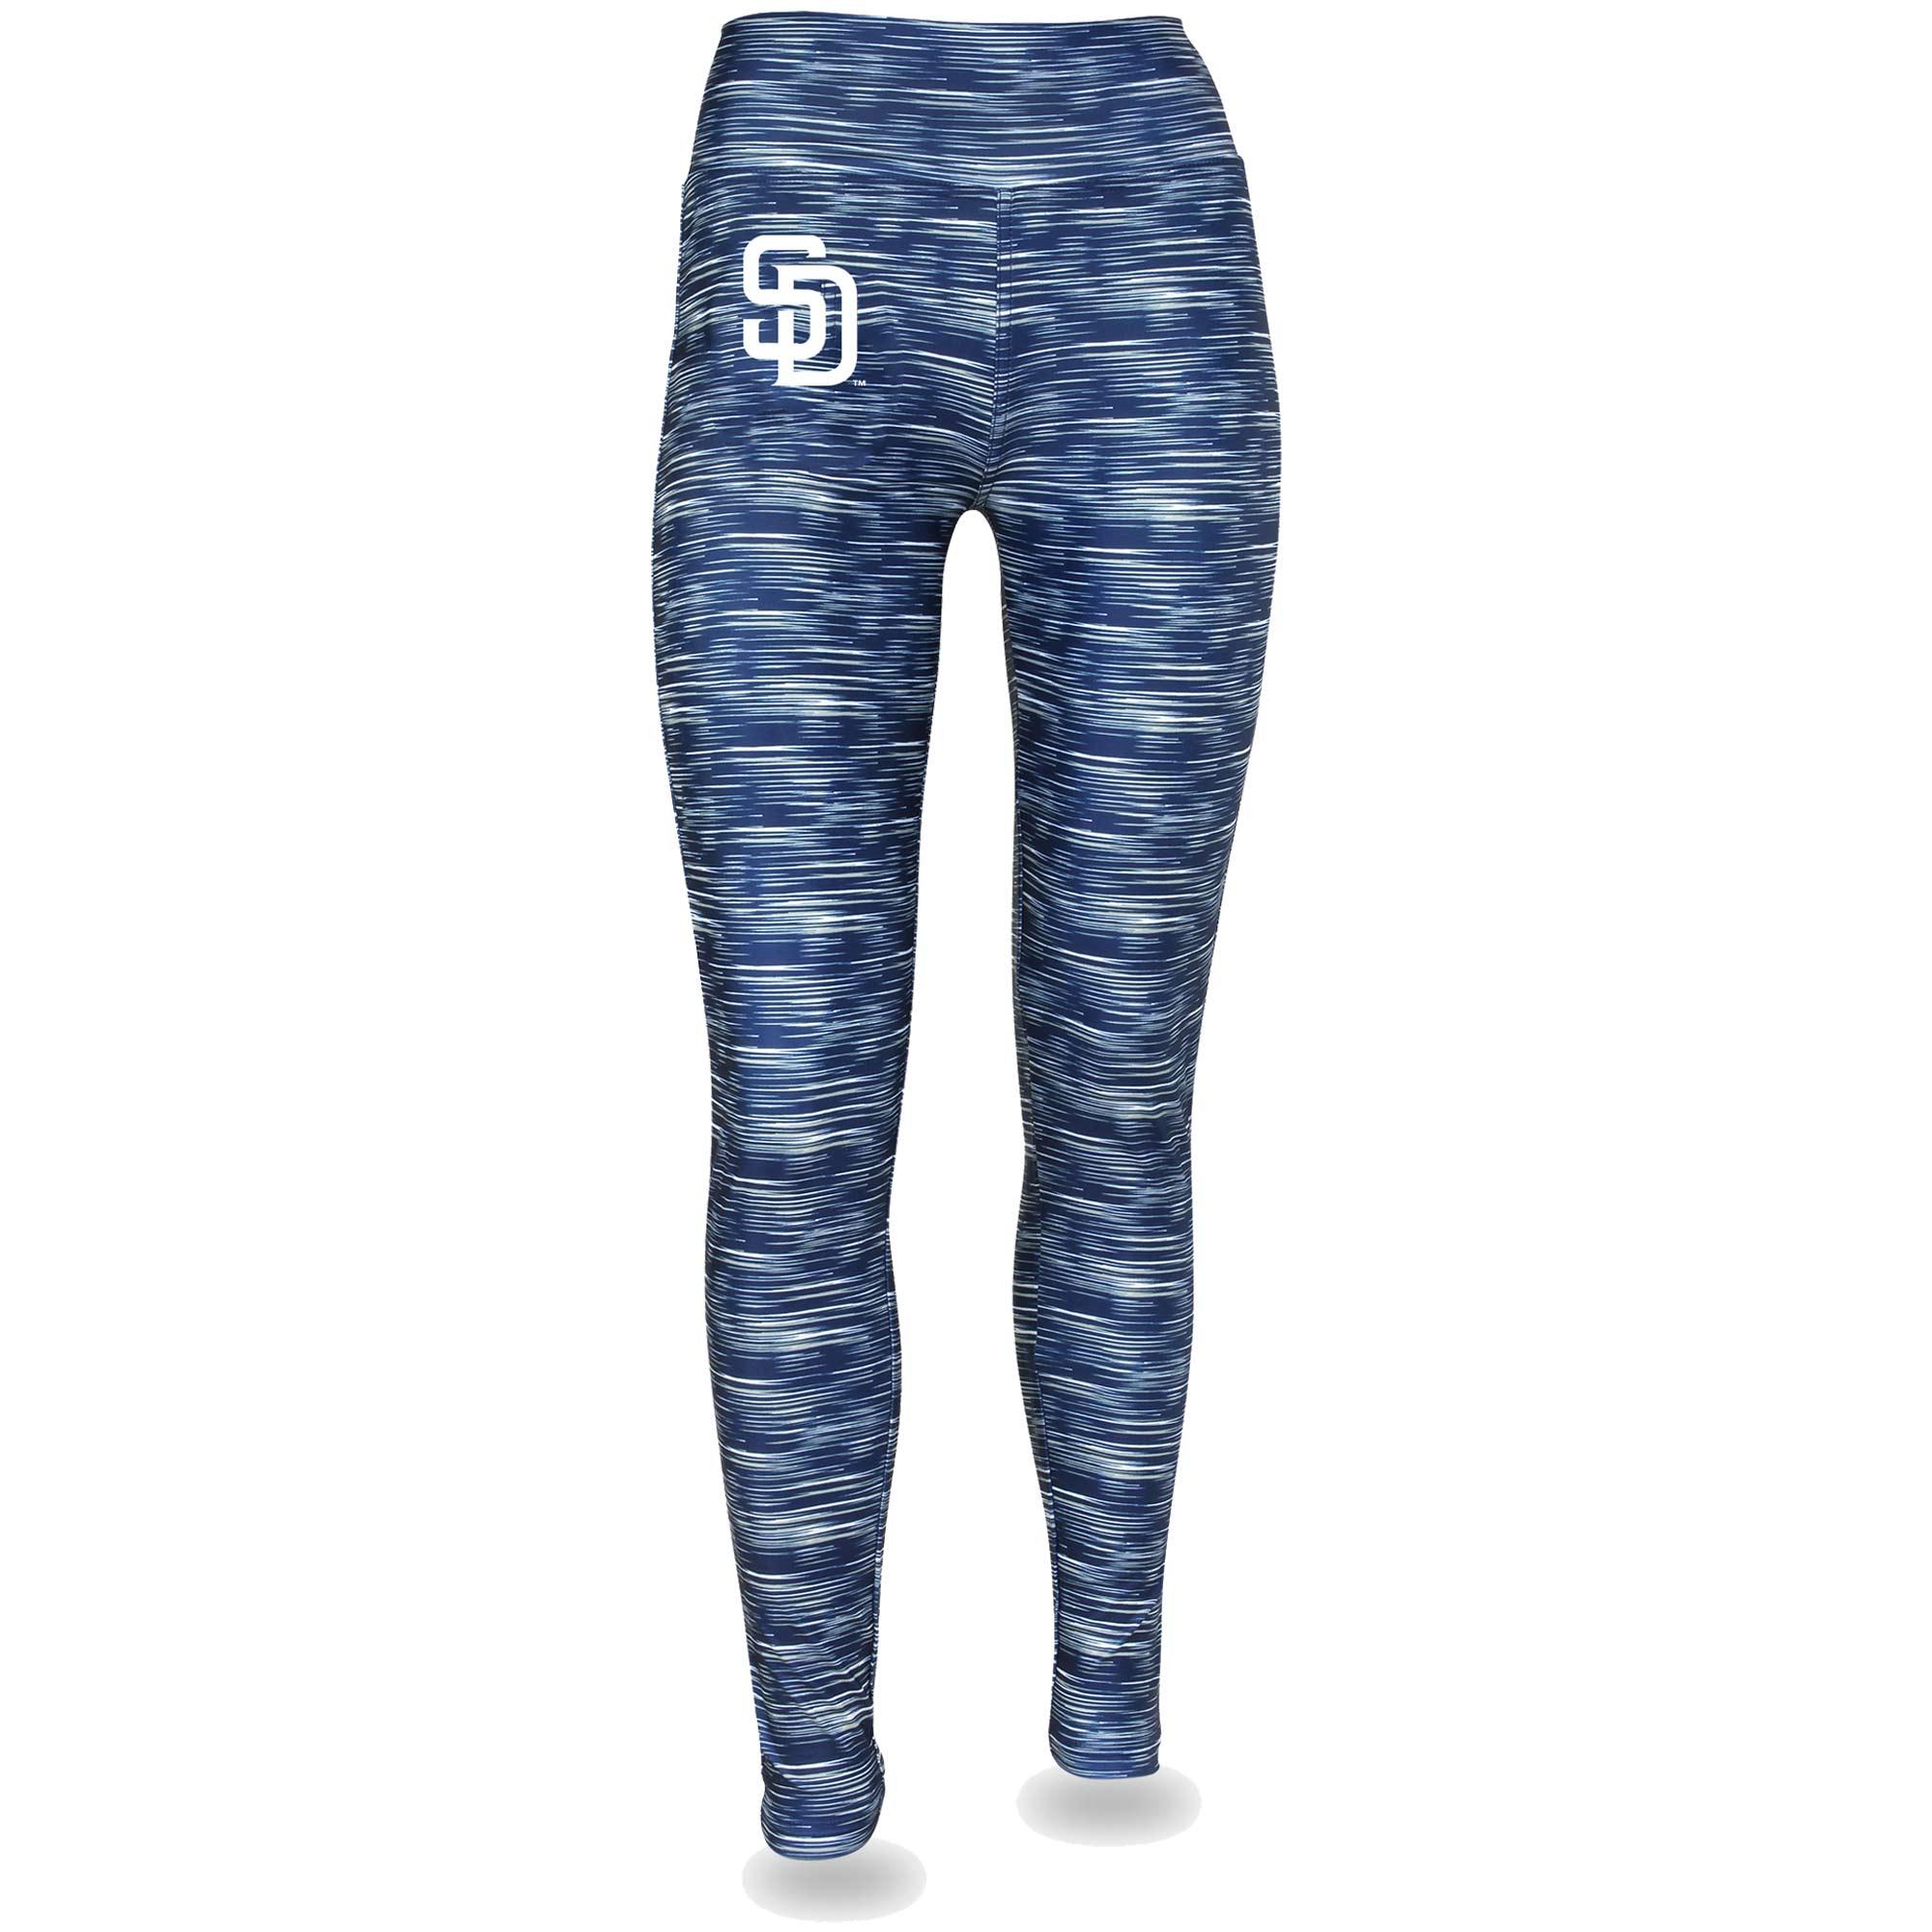 Women's Navy/White San Diego Padres Space Dye Leggings